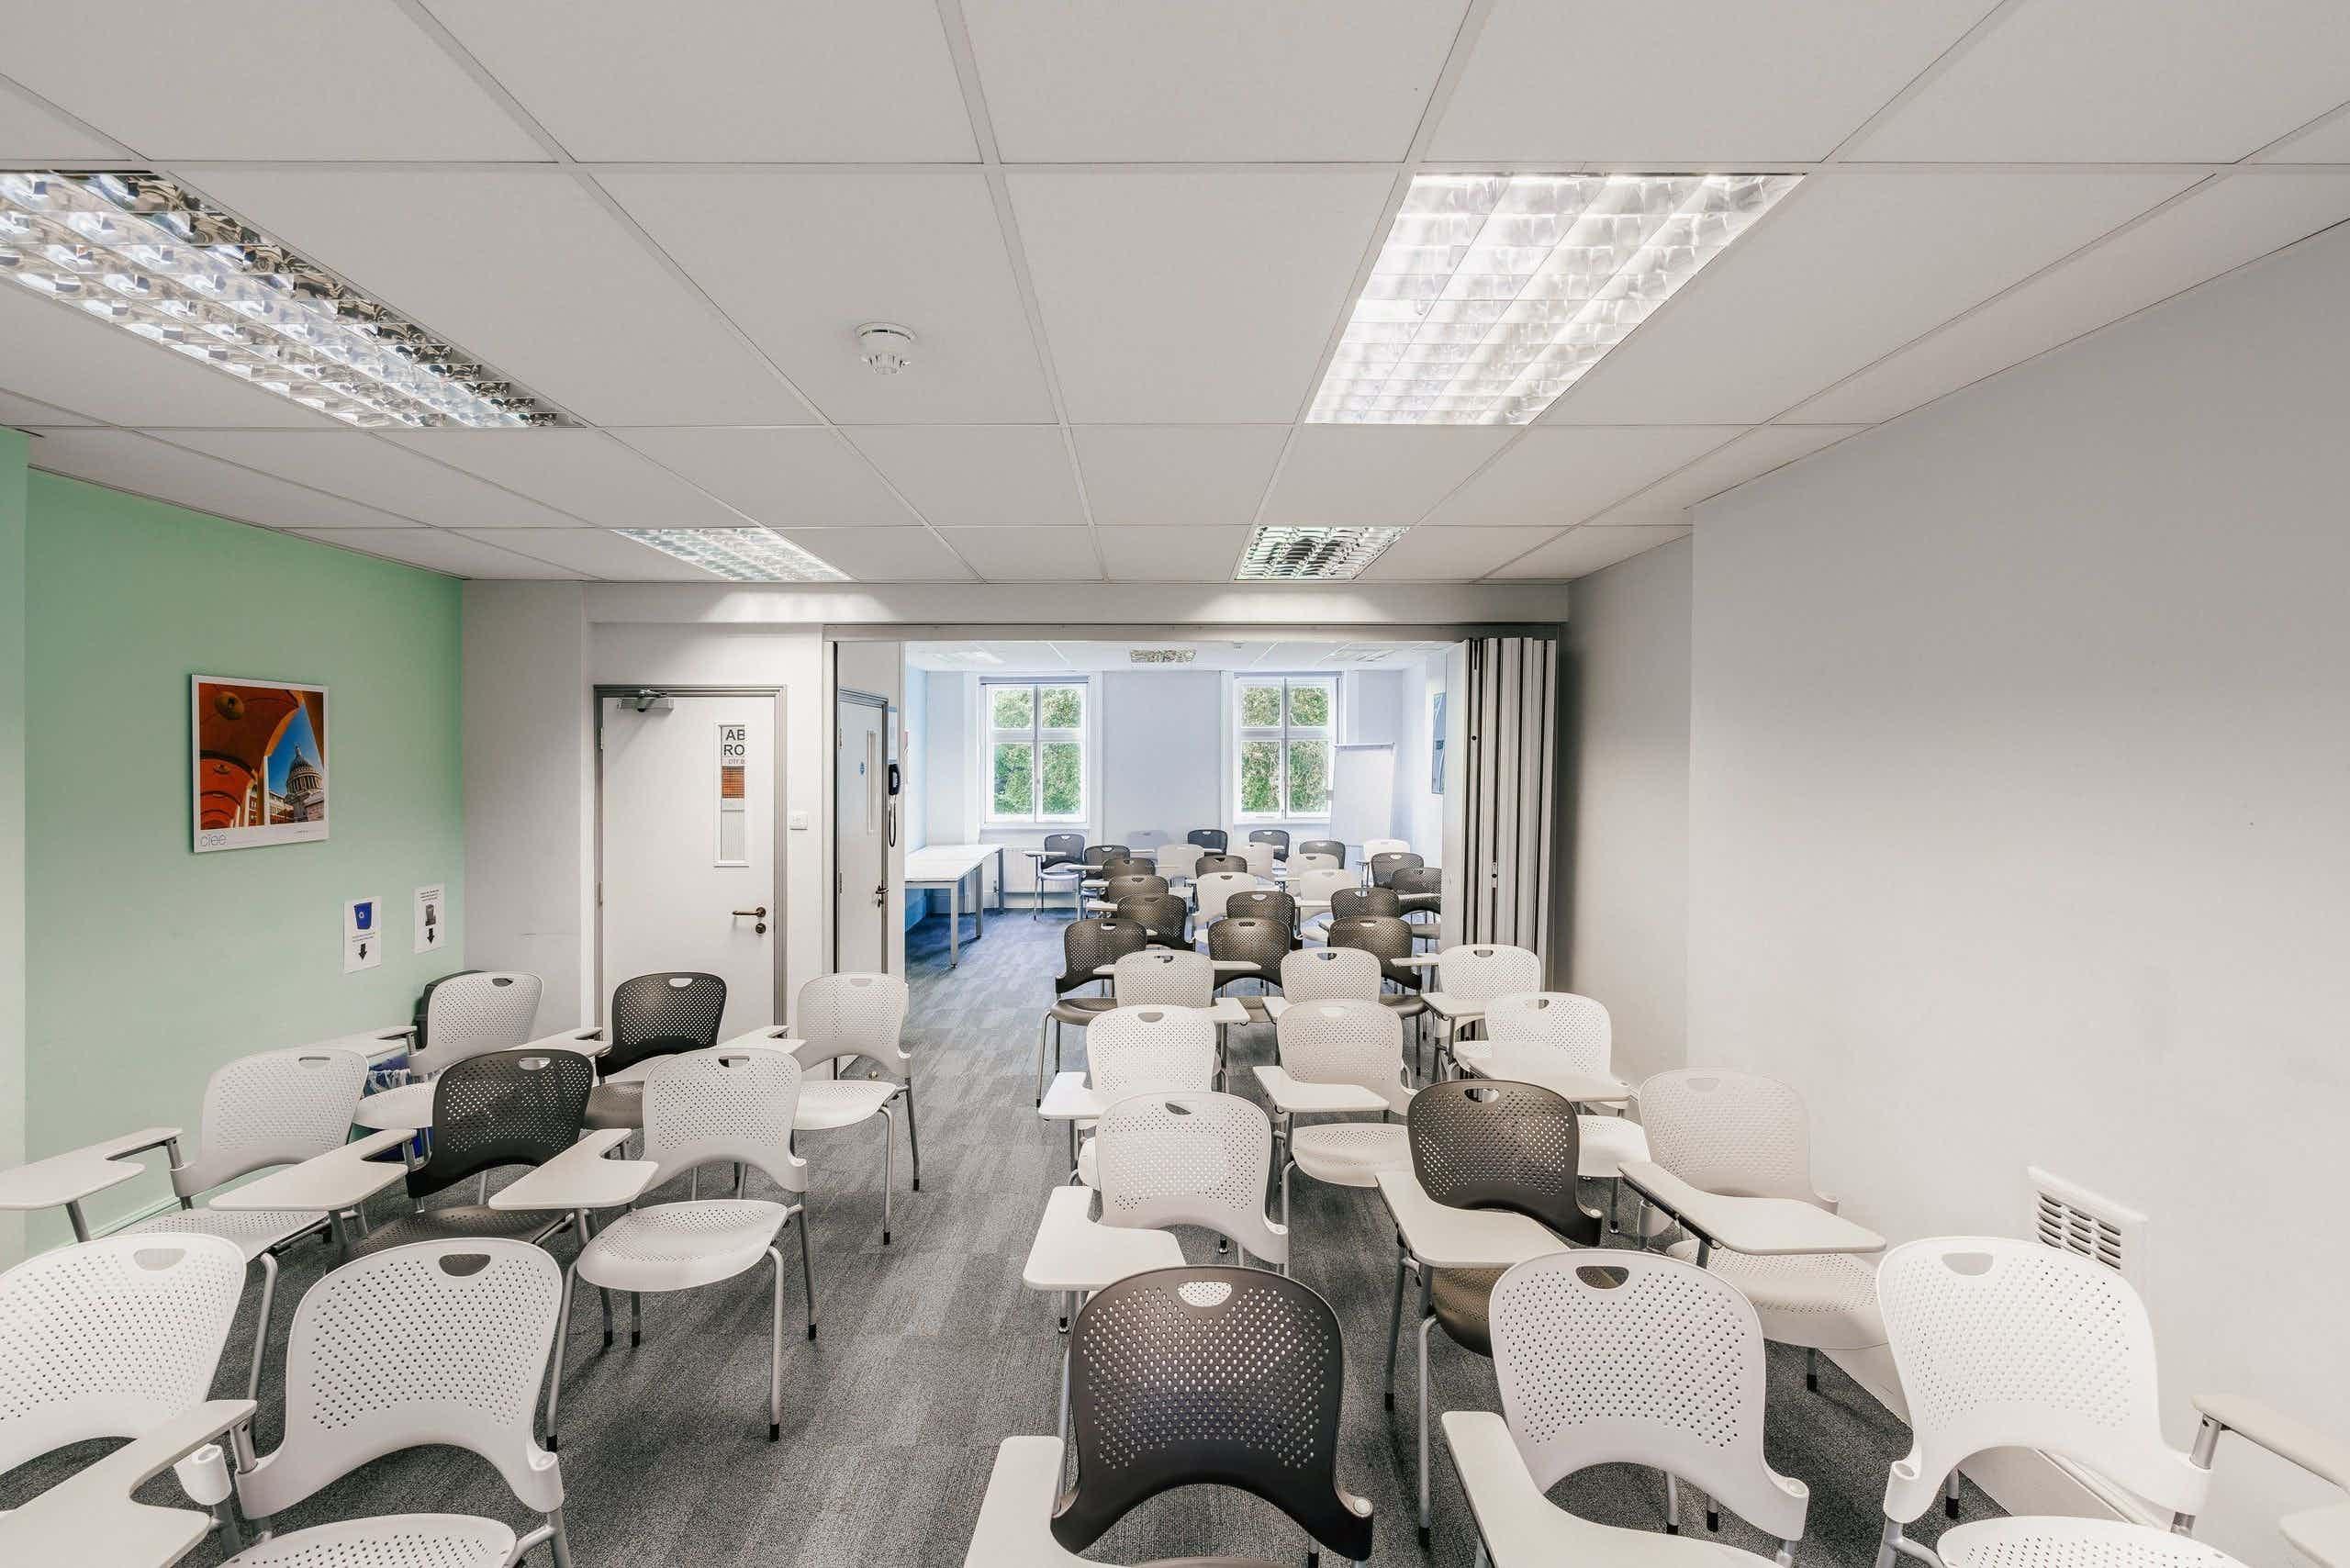 Kew meeting room, CIEE, Russell Square